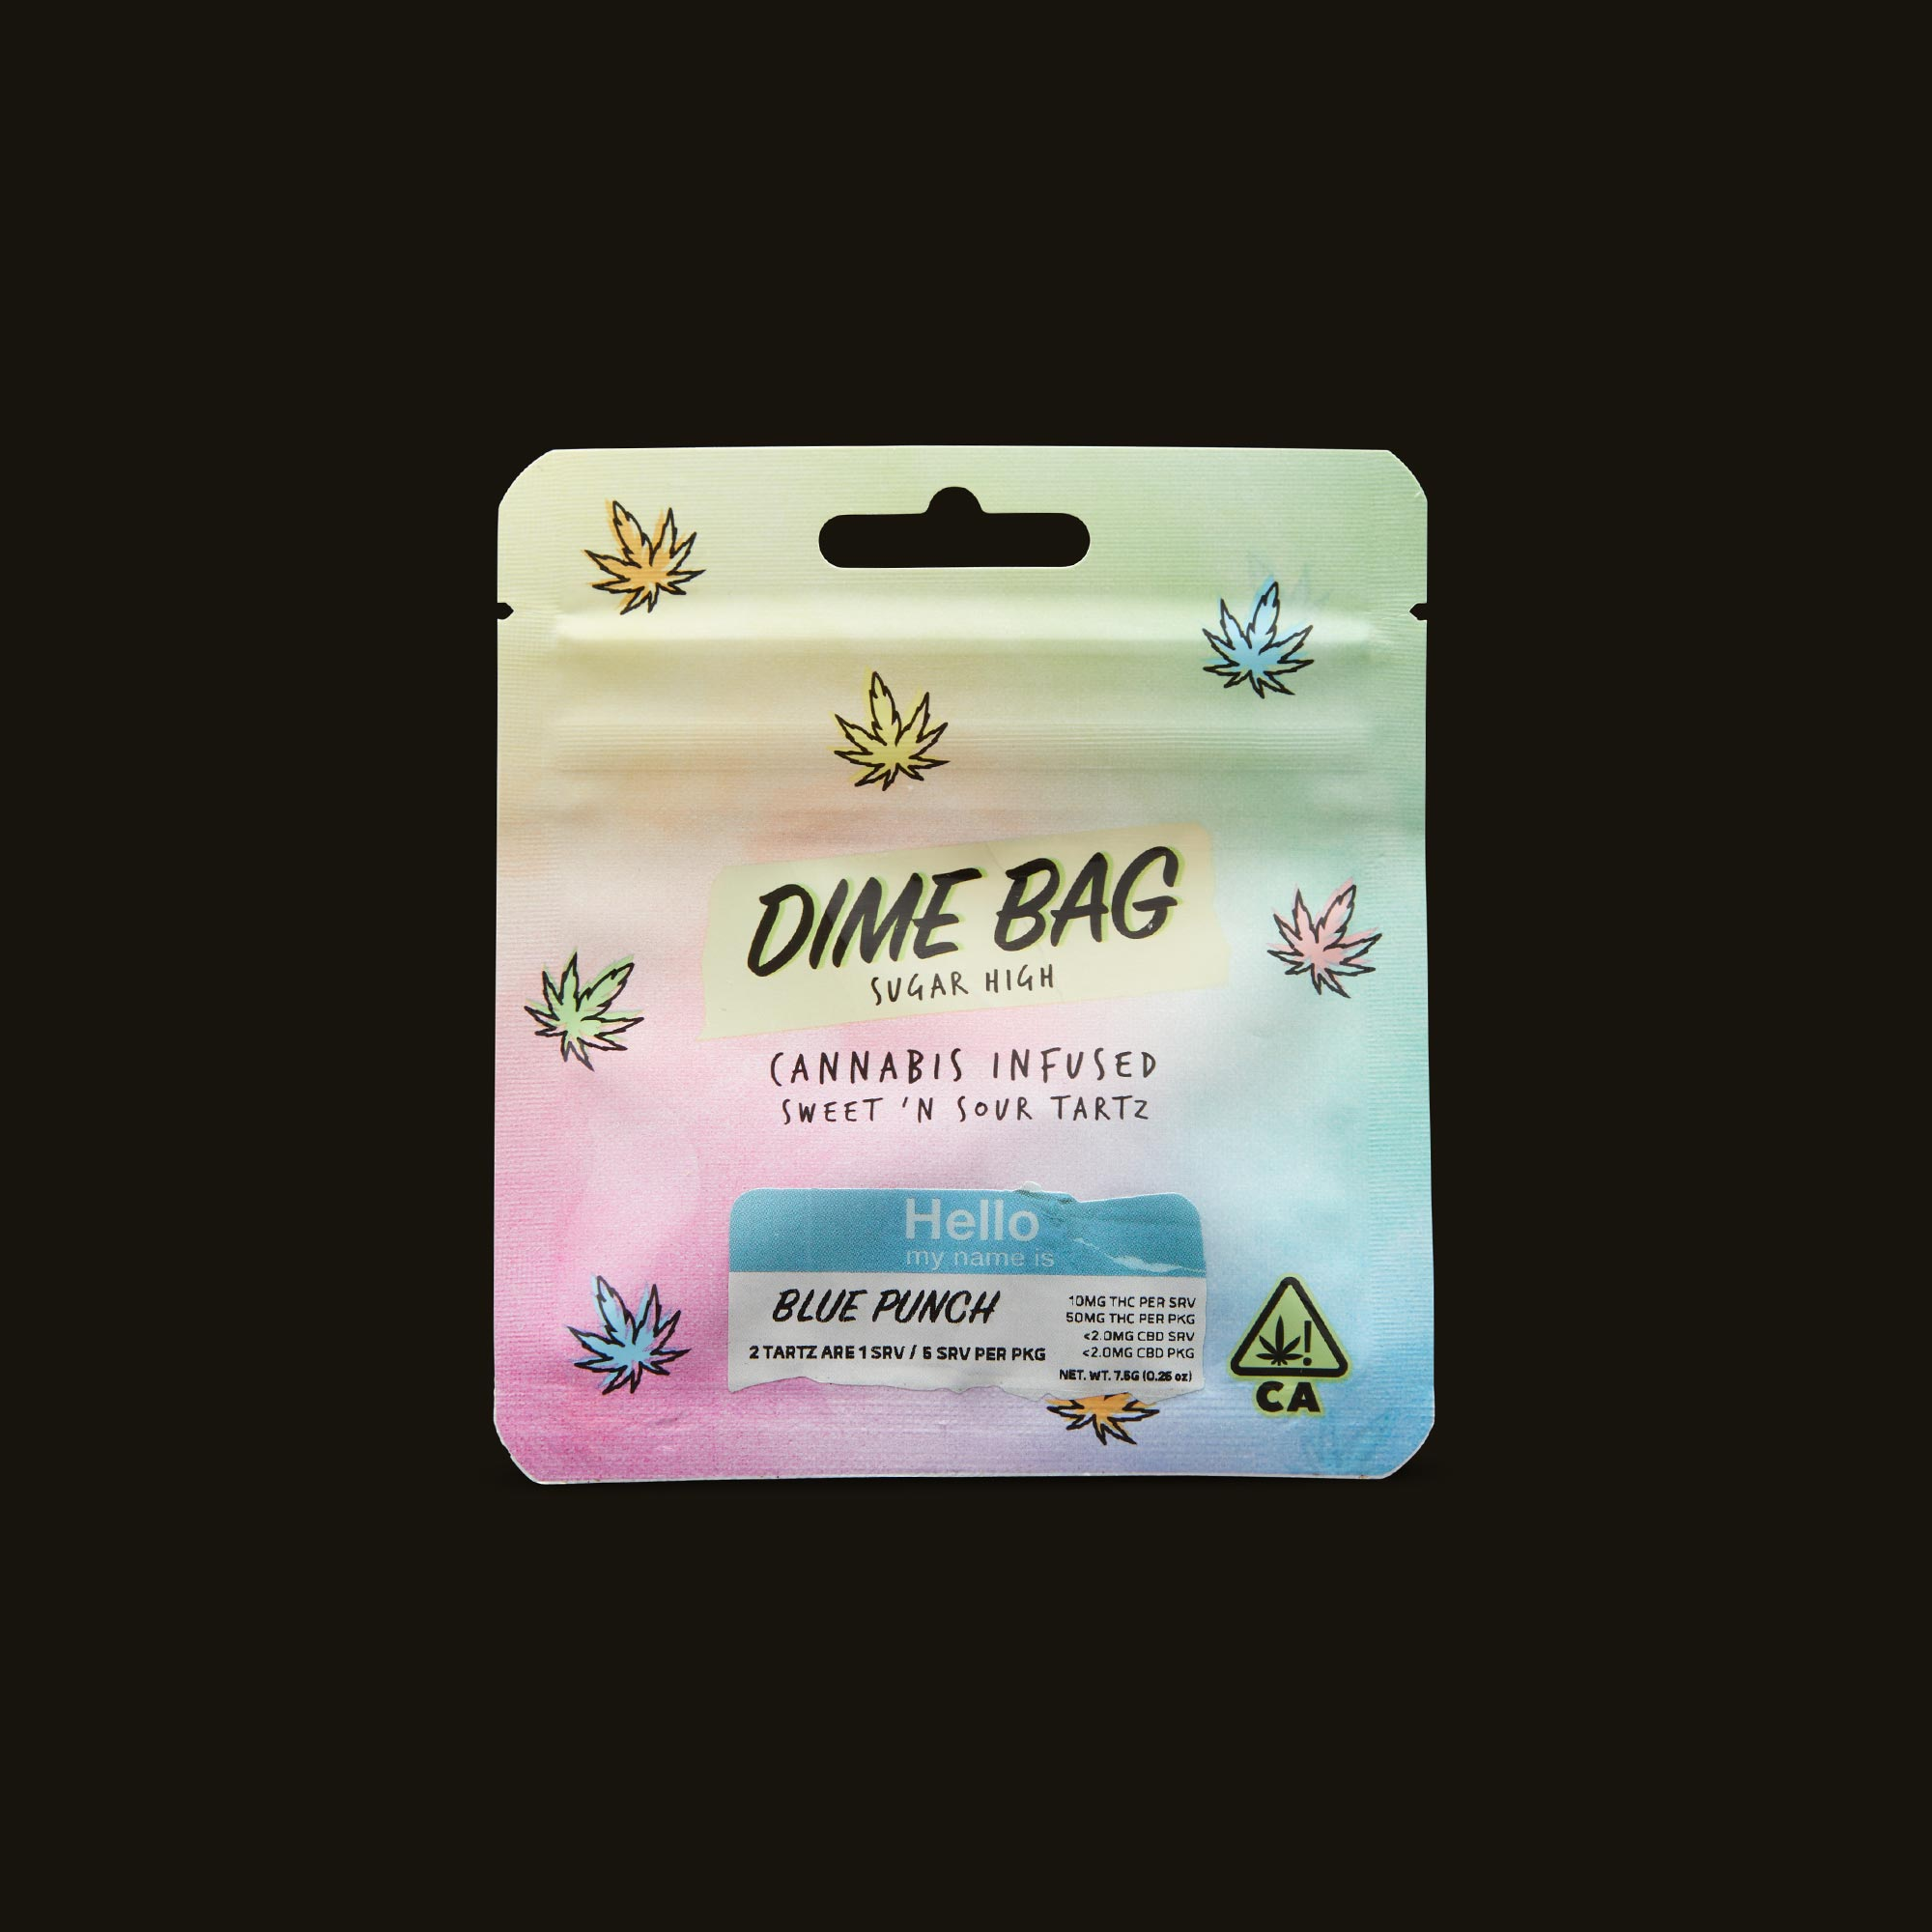 Dime Bag Blue Punch Sweet 'N Sour Tartz Front Packaging